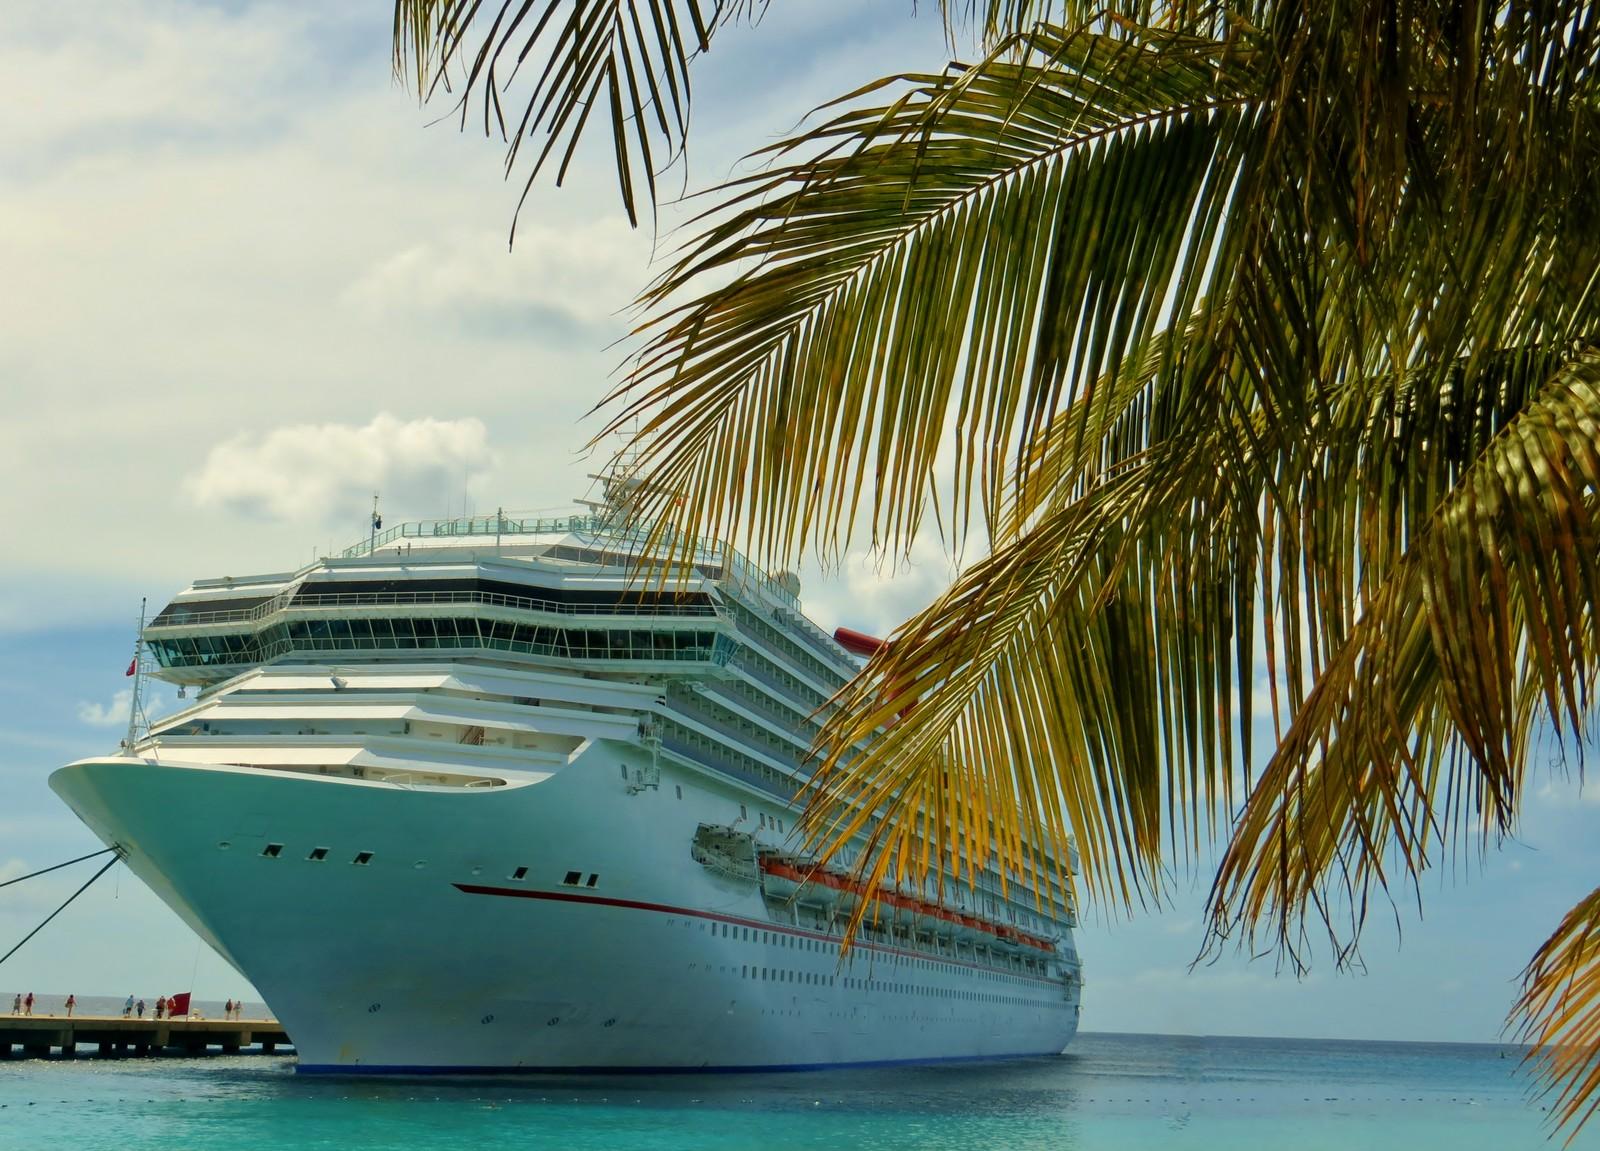 A cruise ship cruises through the Caribbean.